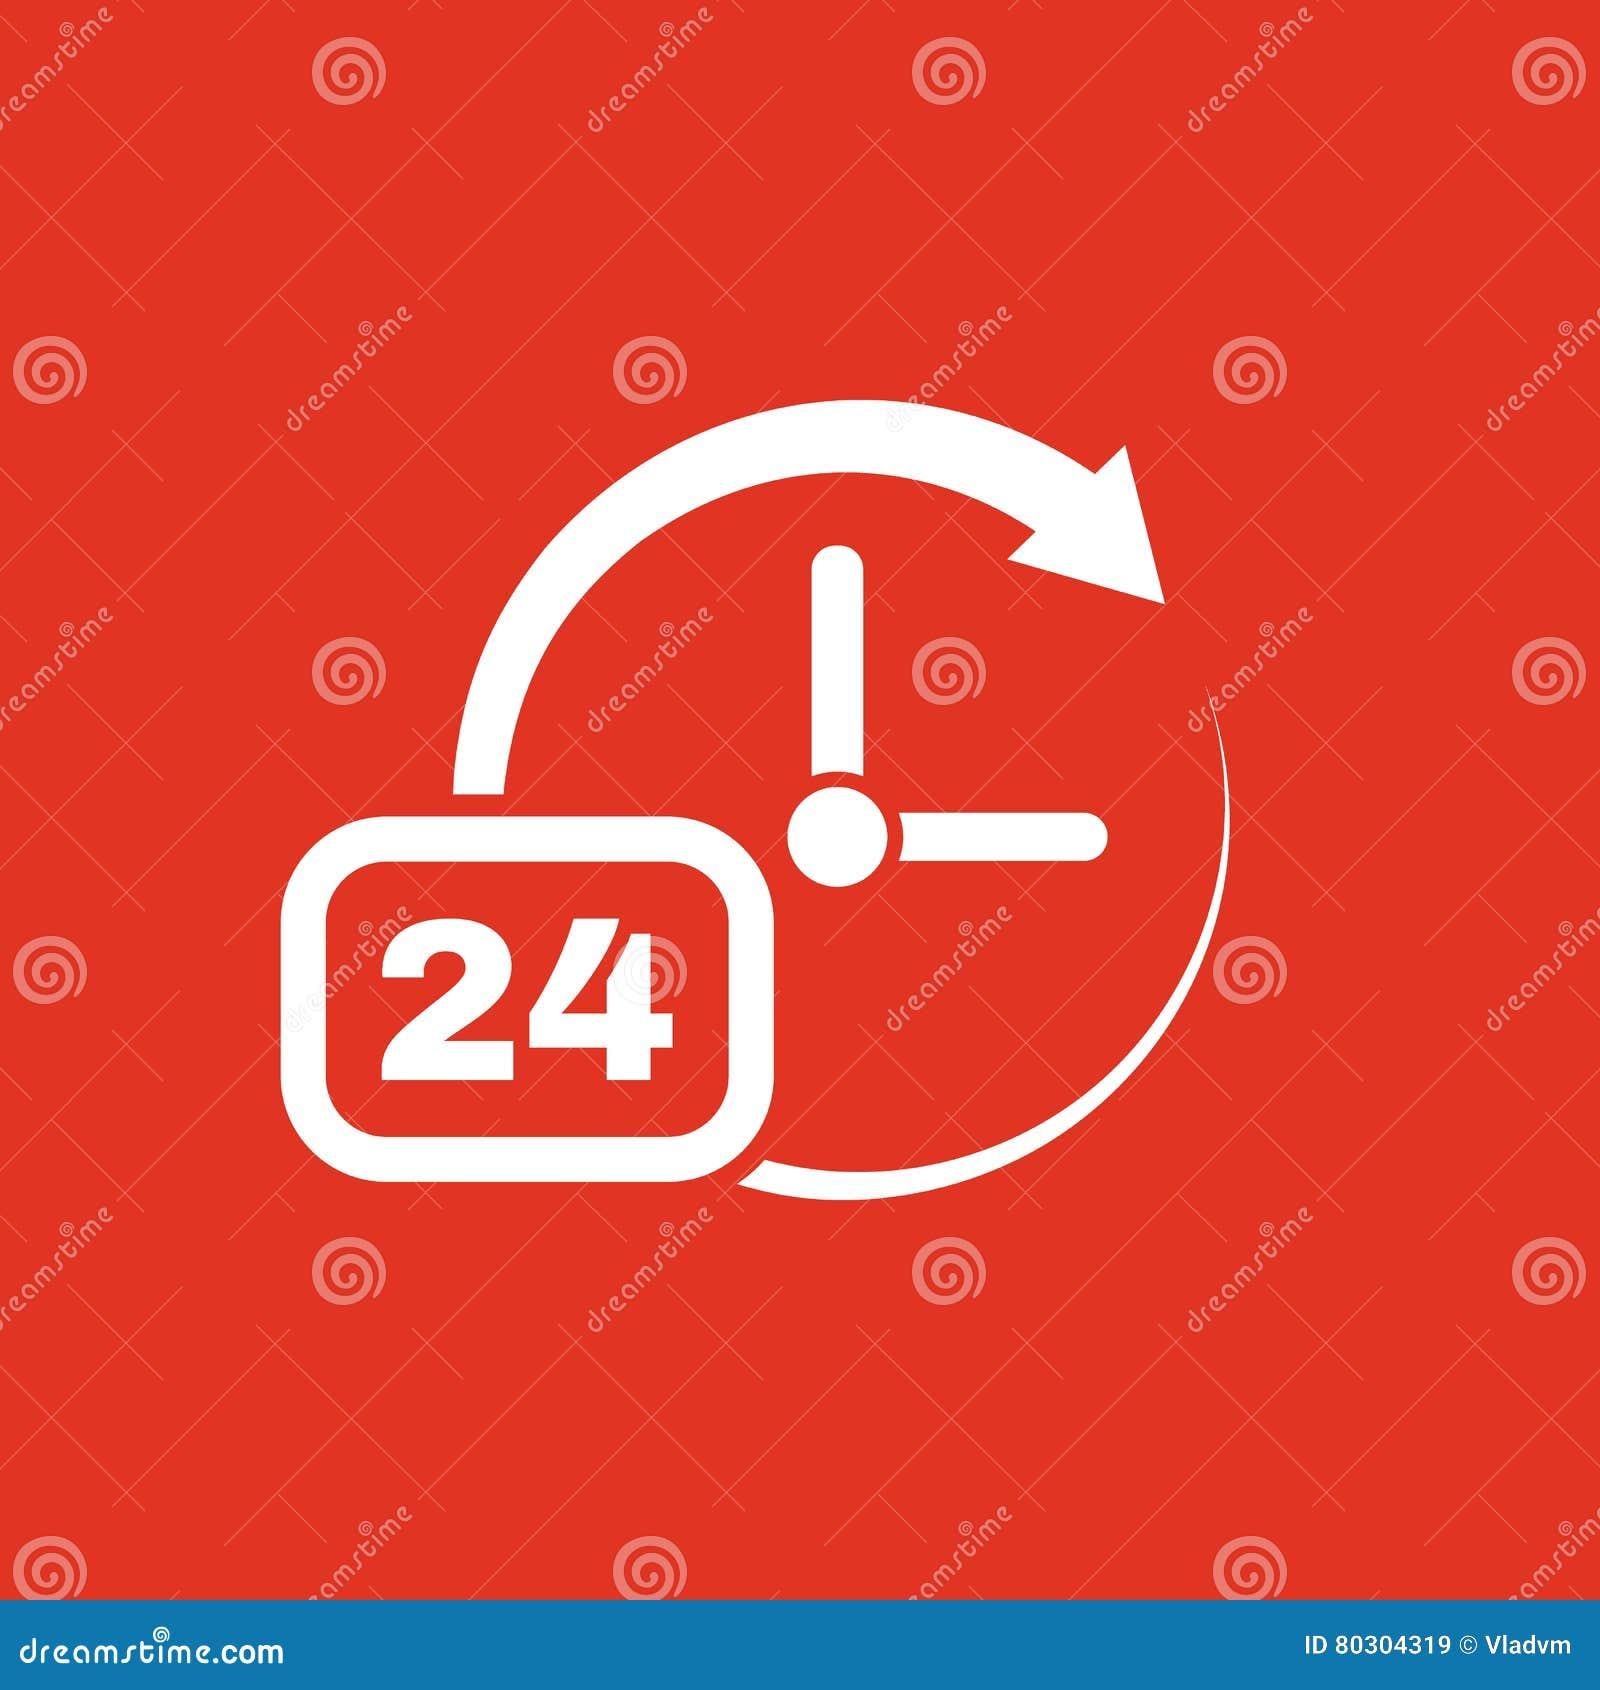 Best Business Logo Design App